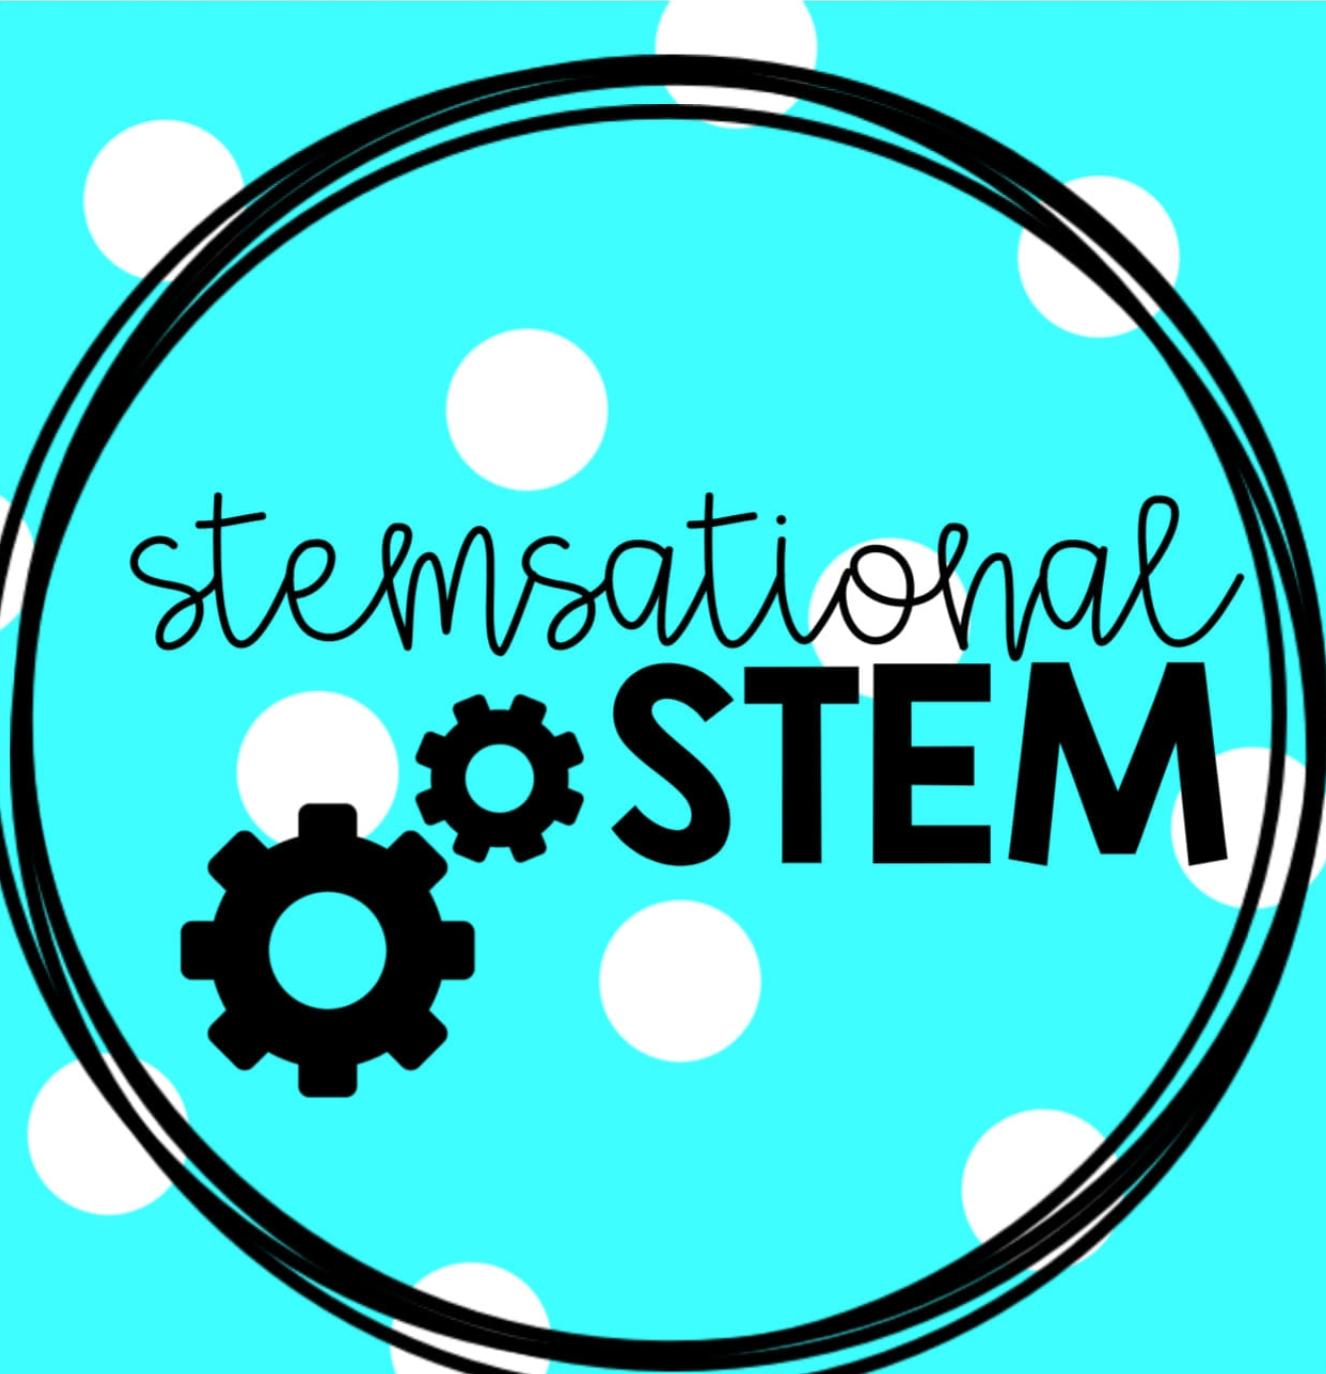 stem-new-logo.png